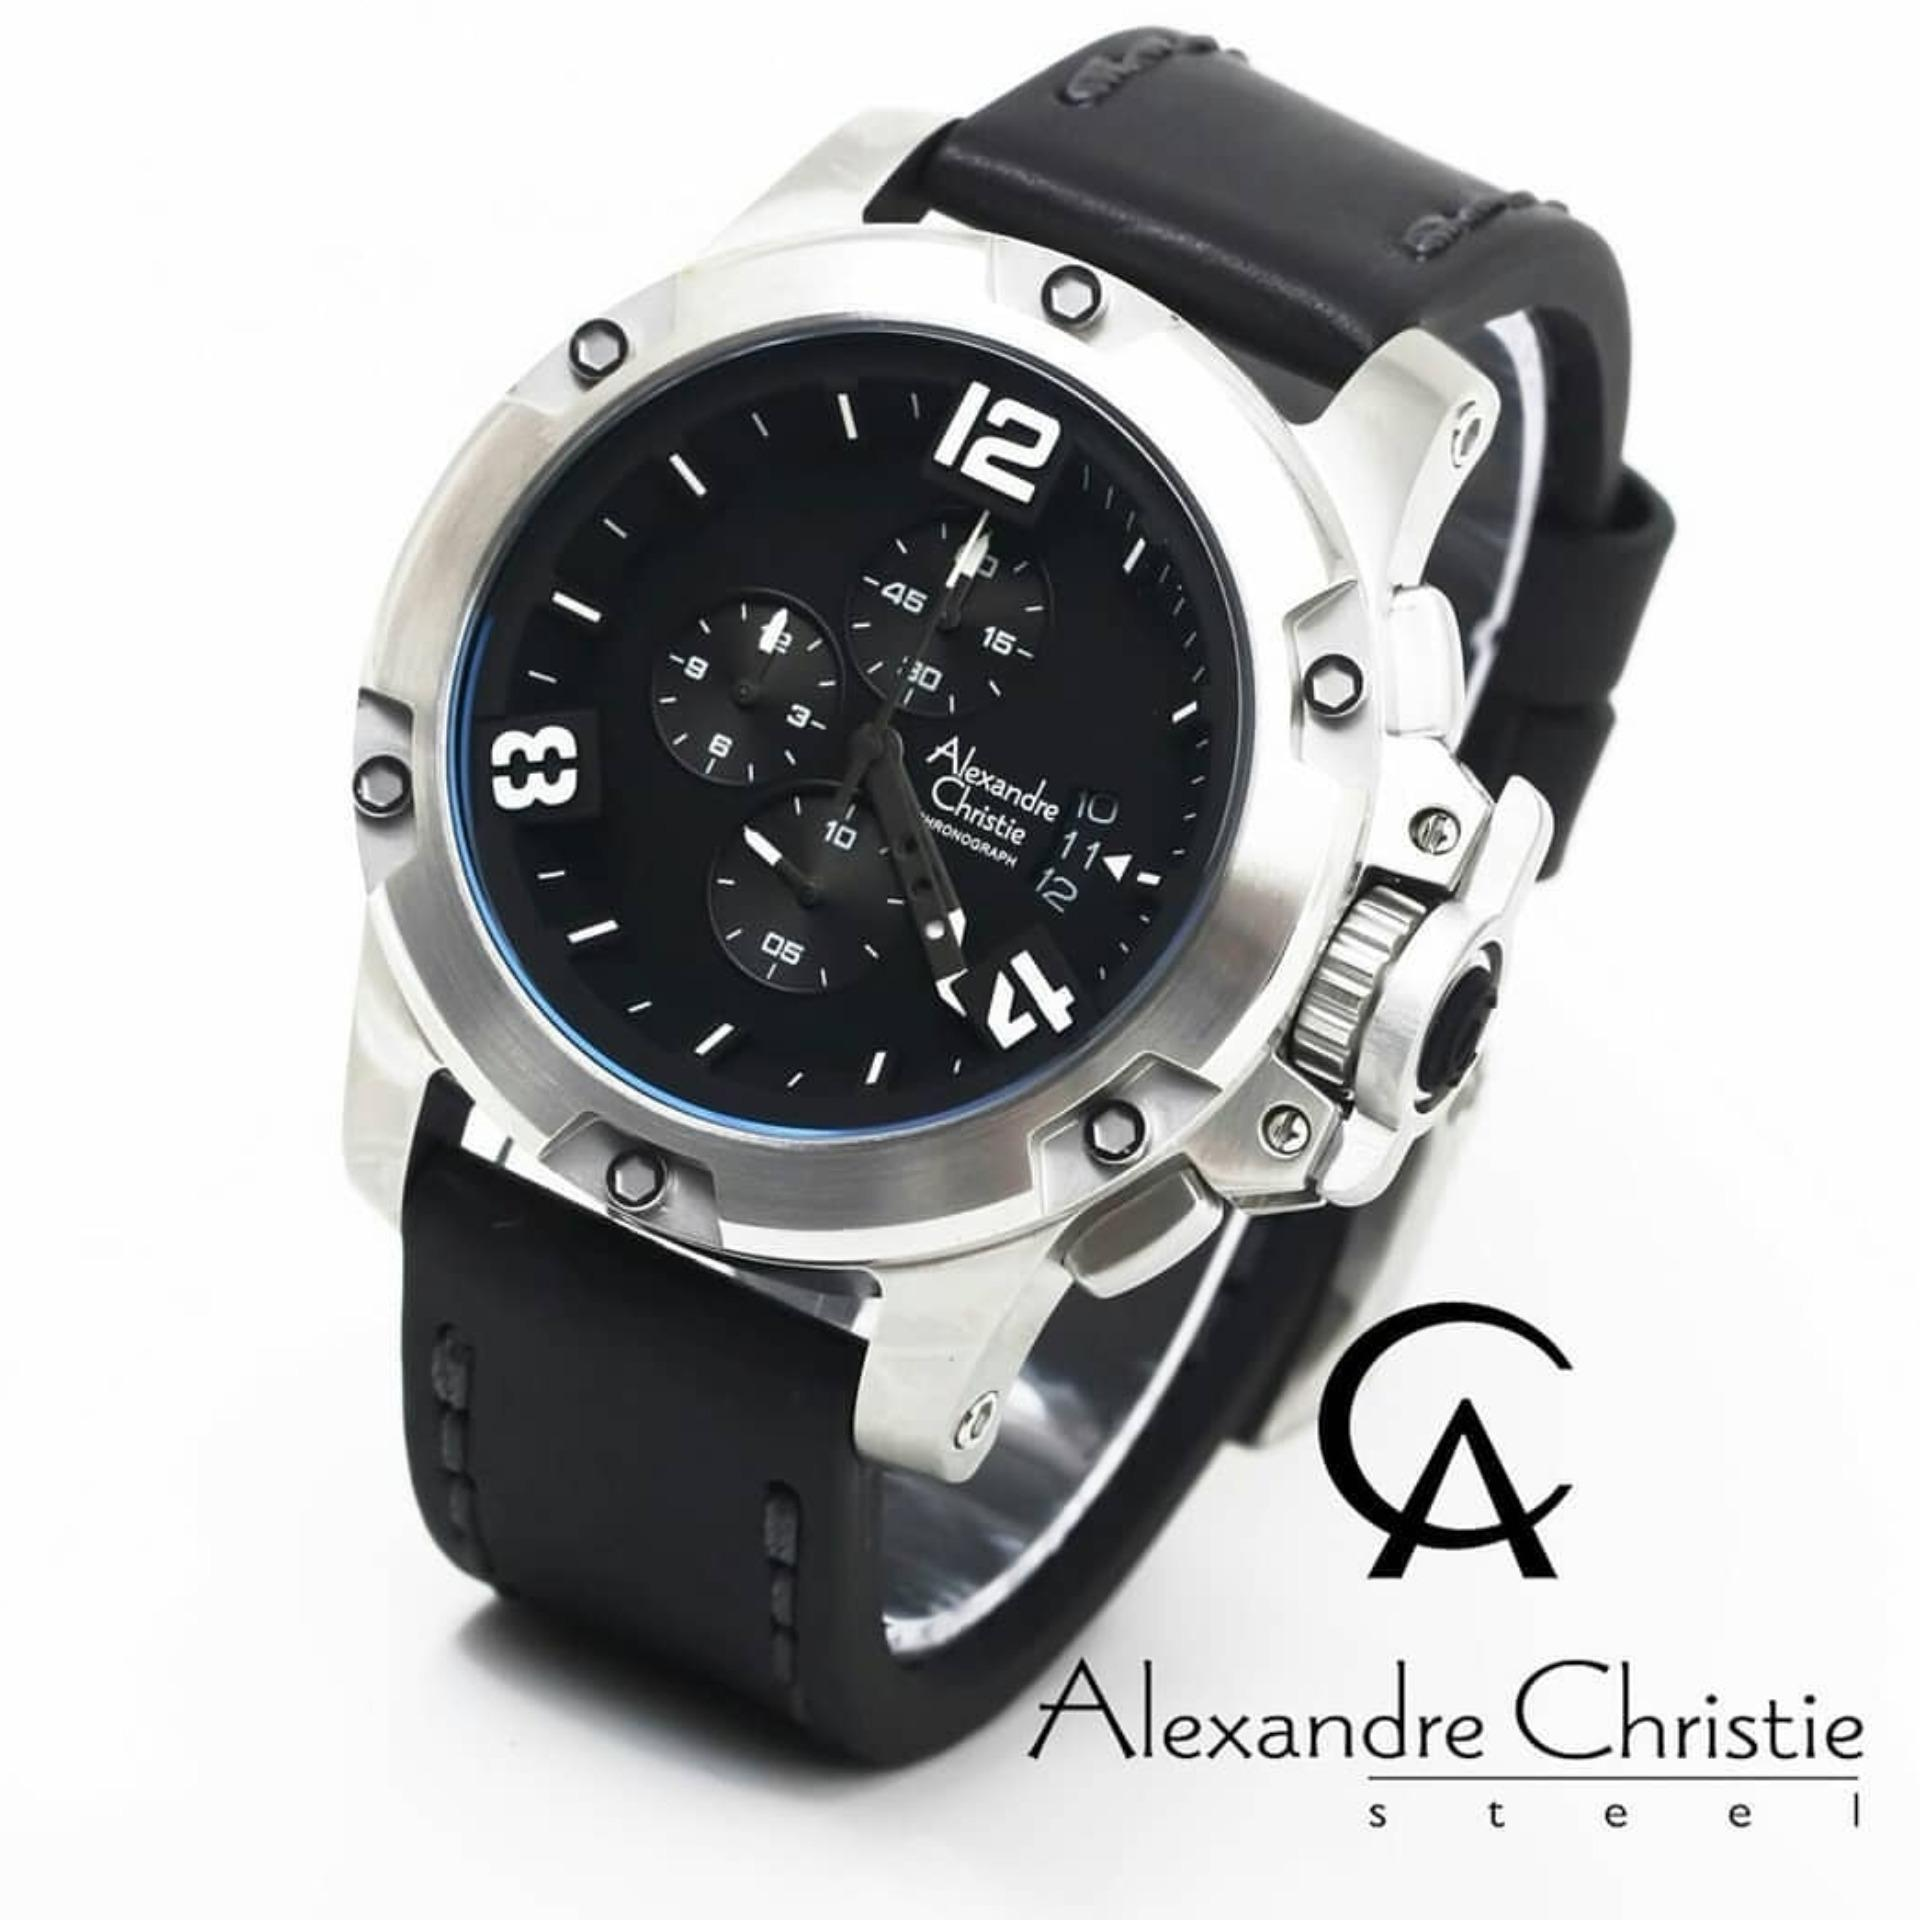 Jam Tangan Alexandre Christie Lazada Ac 6442 Couple Full Black Original Ac6295m Pria Leather Strap Hitam Silver